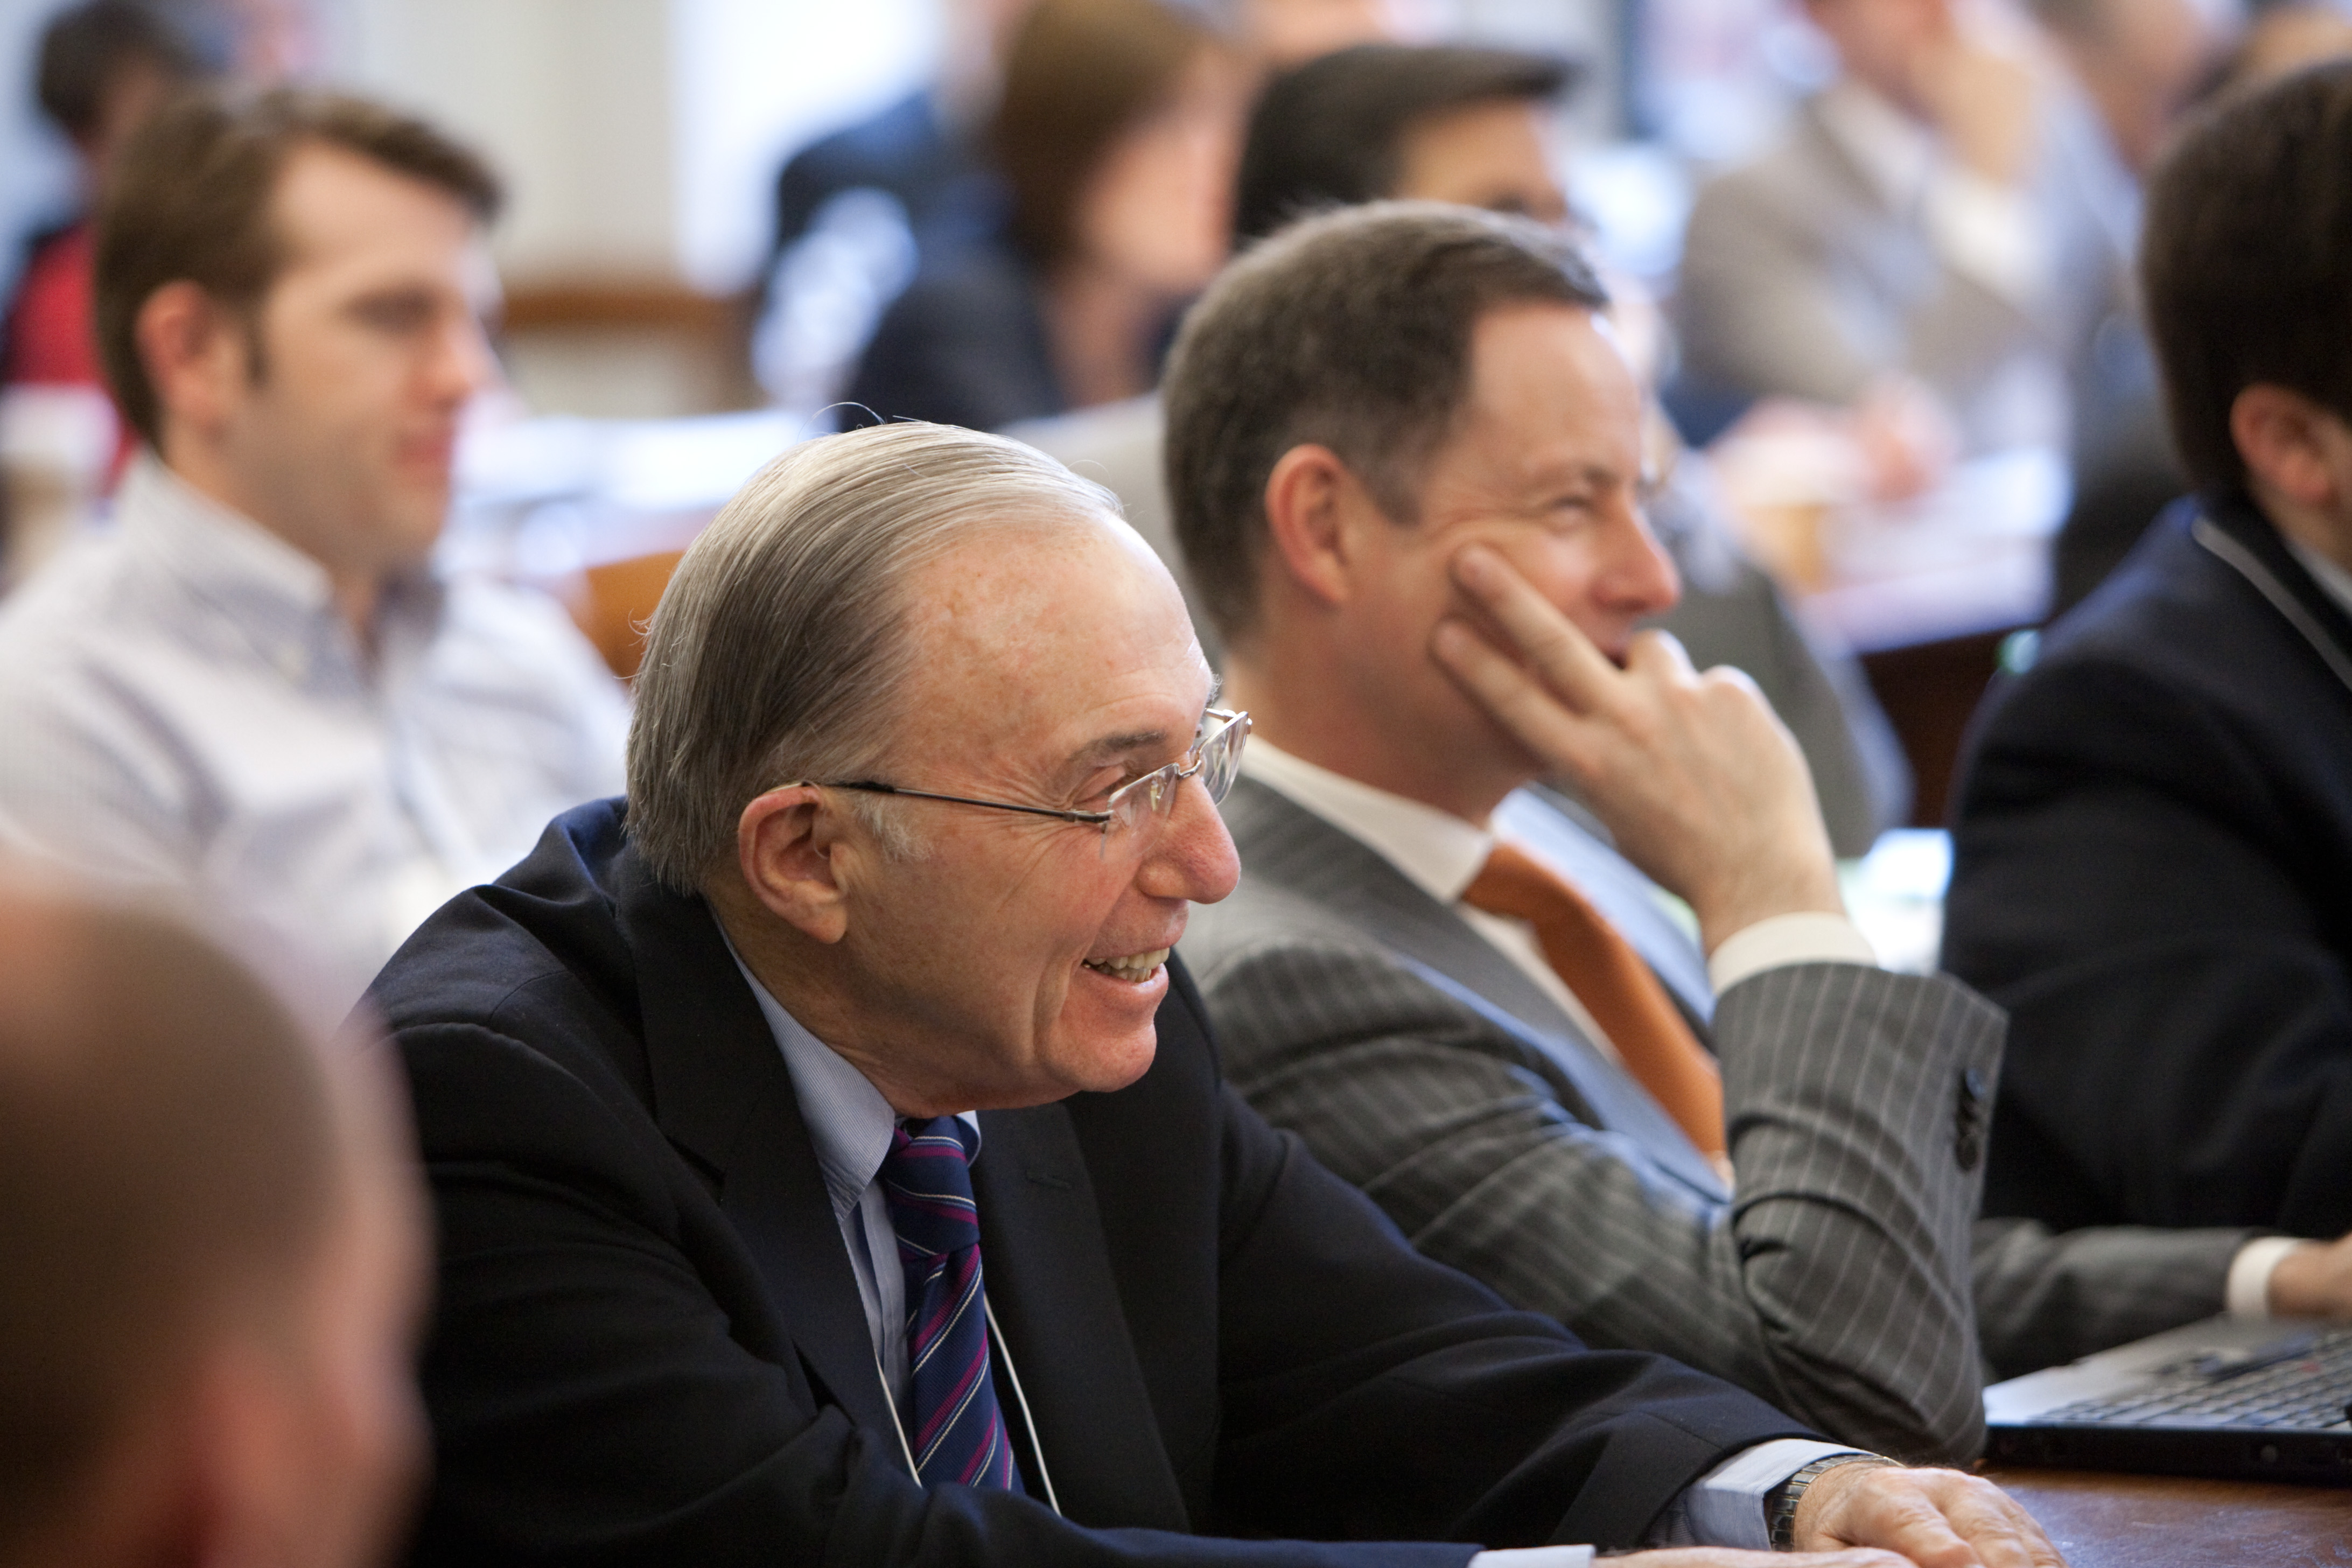 Robert Todd Lang '47 and ETH Zurich Prof. Gerard Hertig